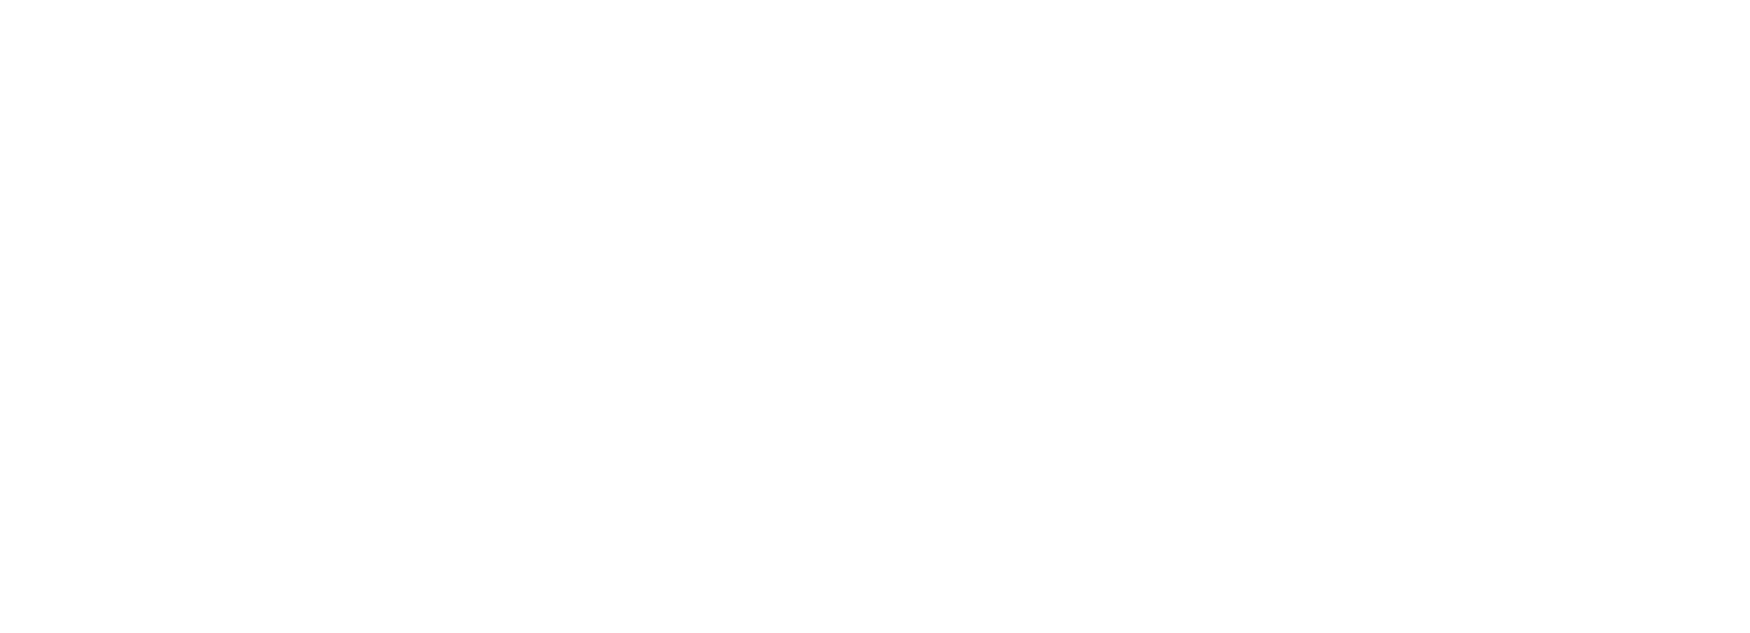 cnz_logo_png_white